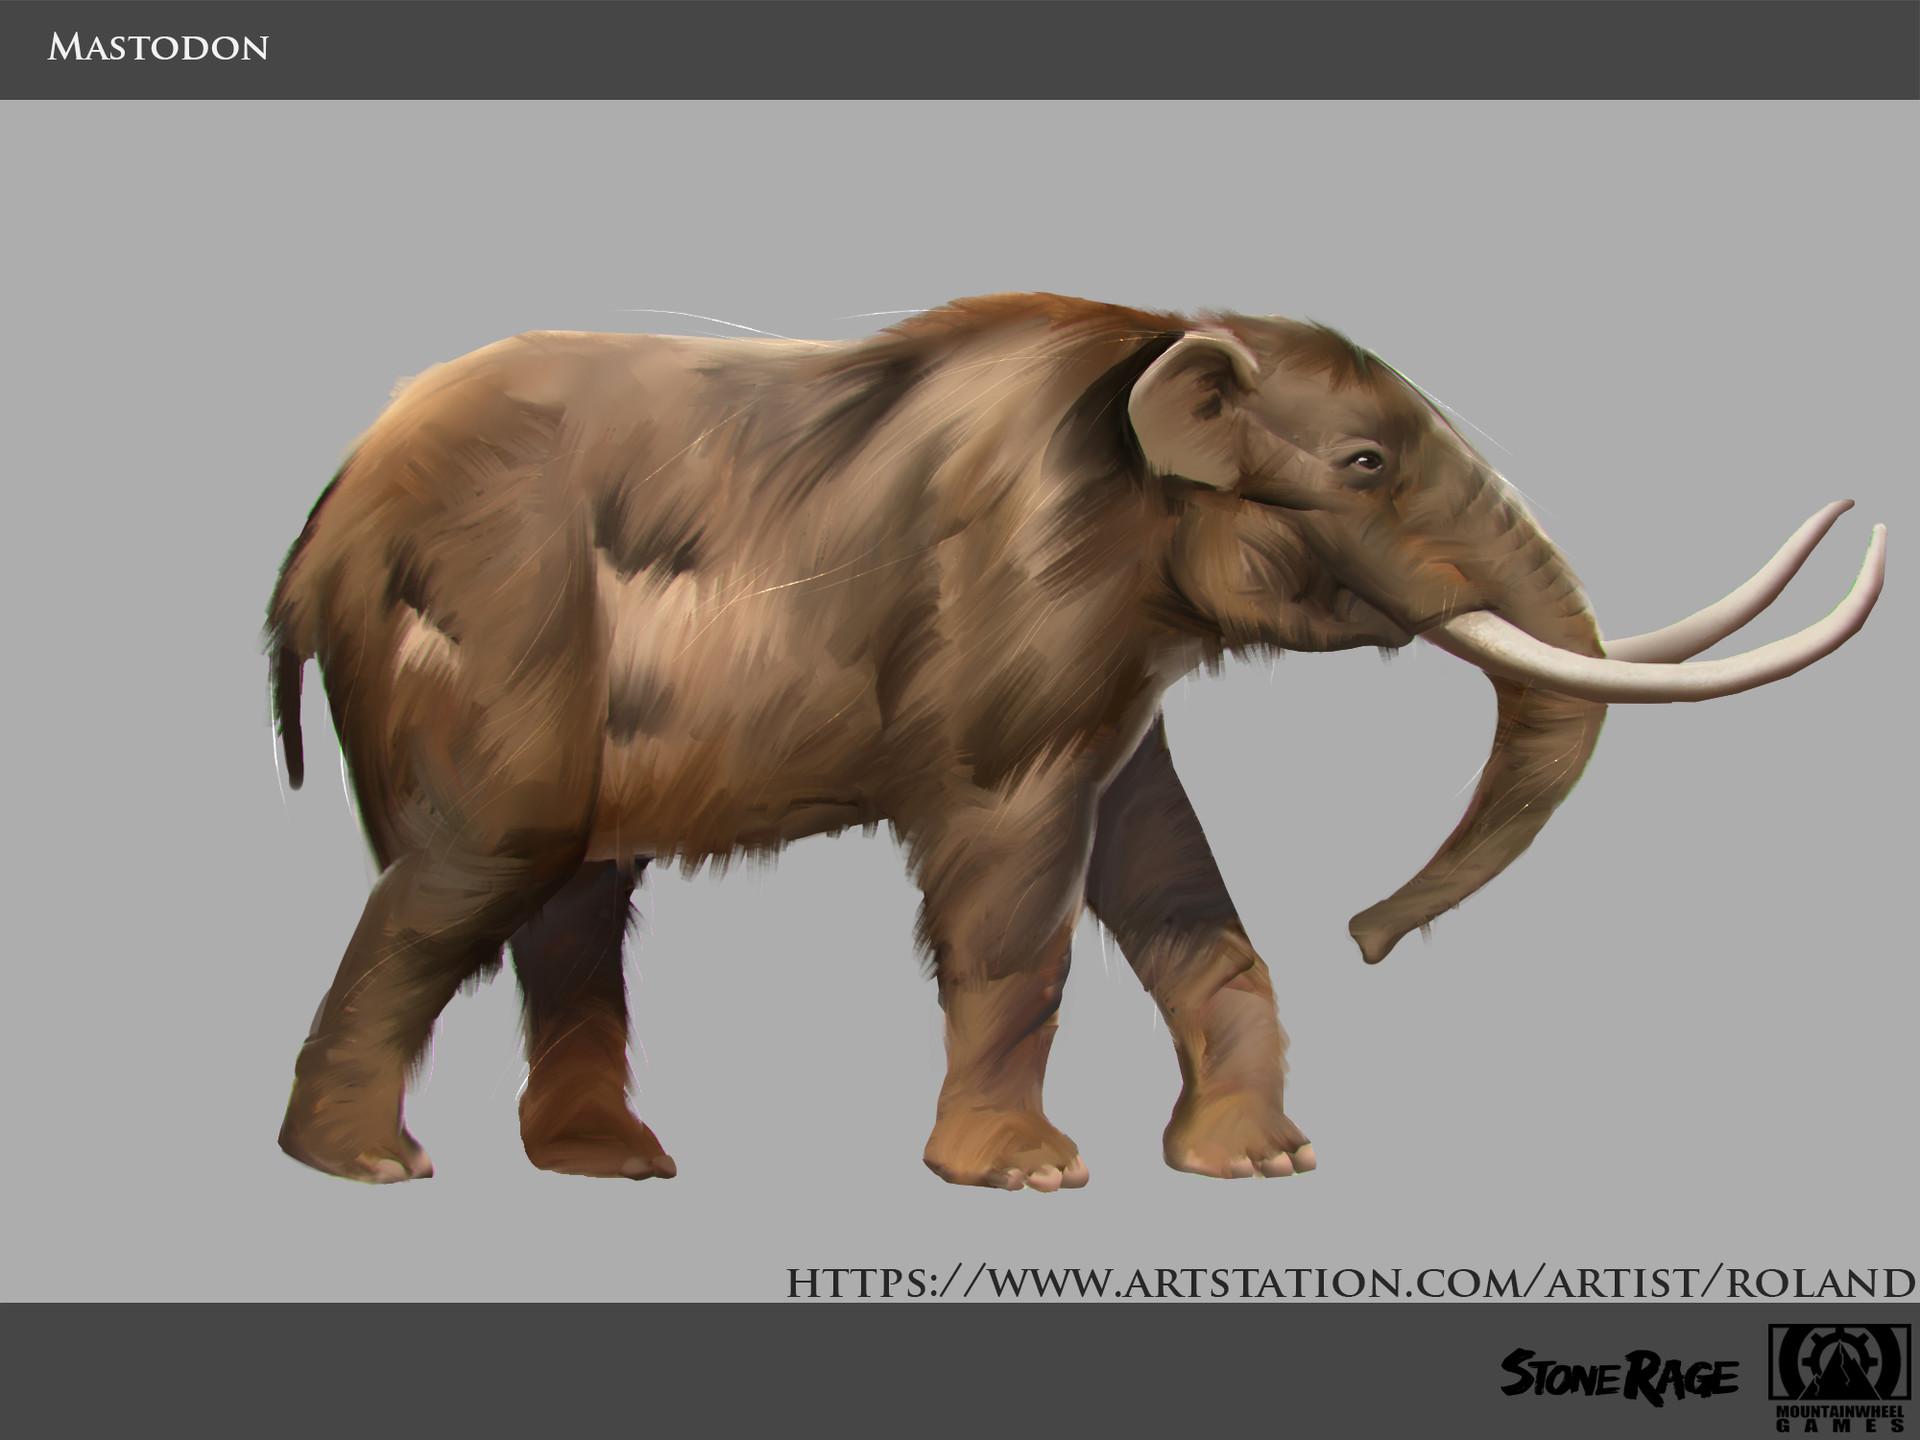 Lucaciu roland sr mastodon sta